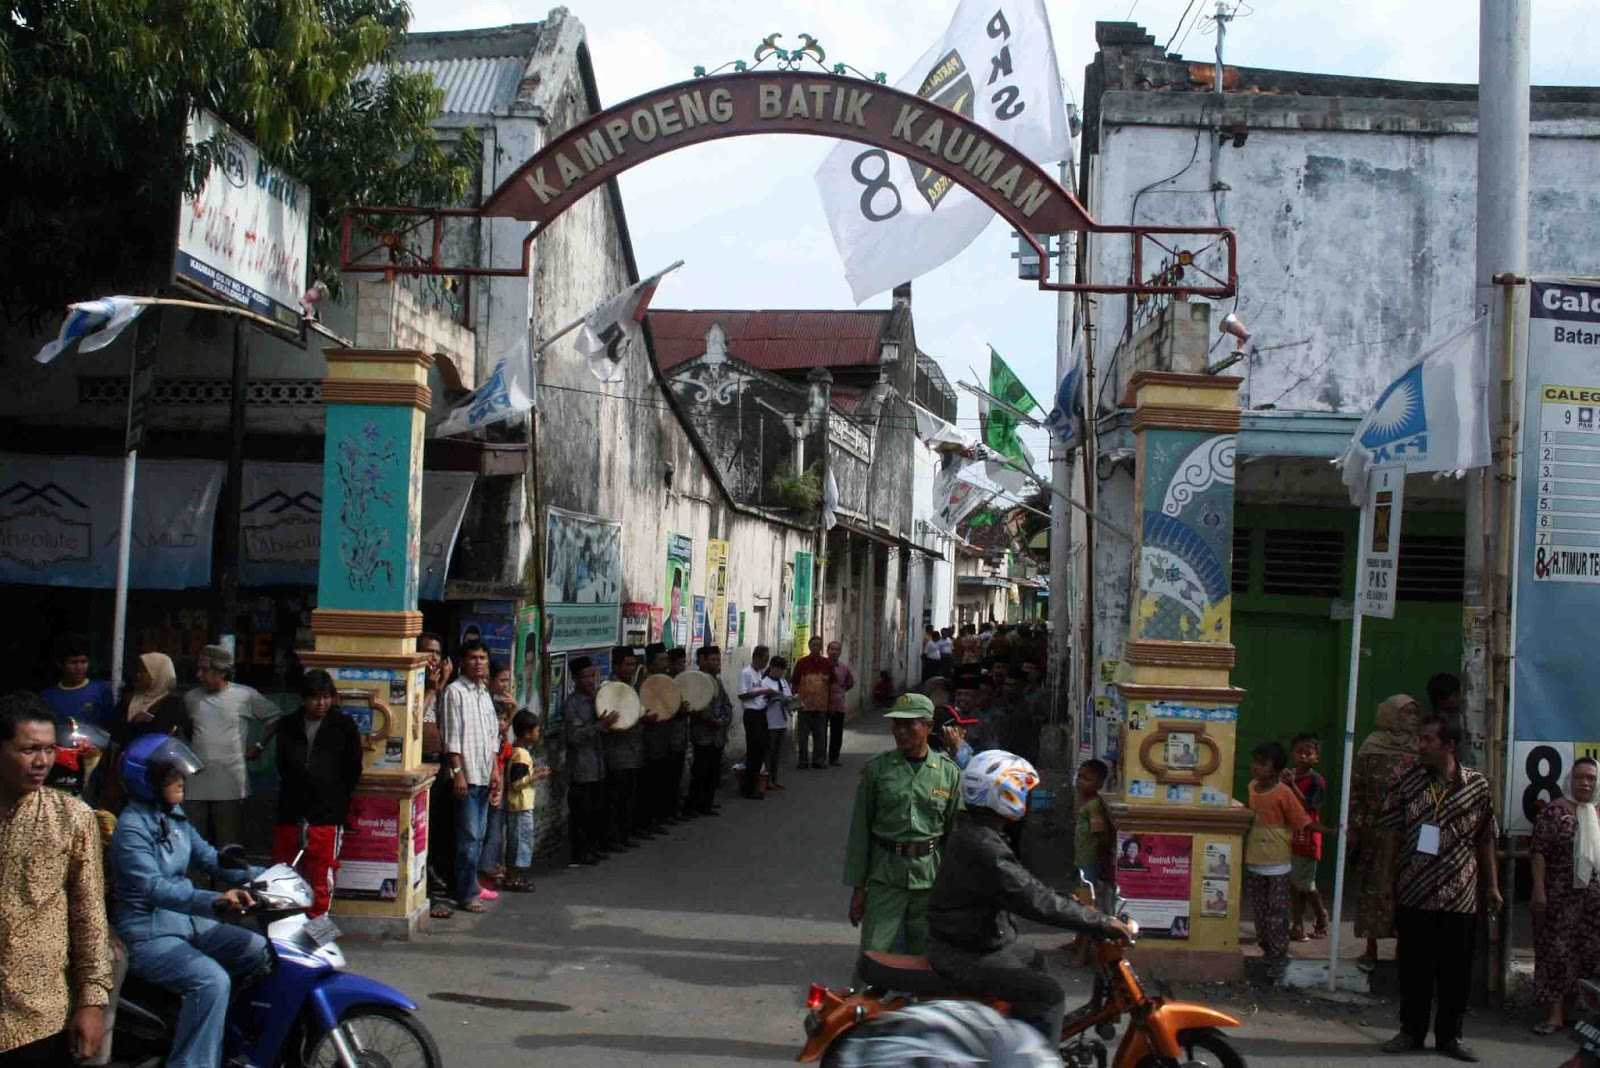 Wisata Belanja Kampoeng Batik Kauman Pekalongan Kampung Yogyakarta Kota